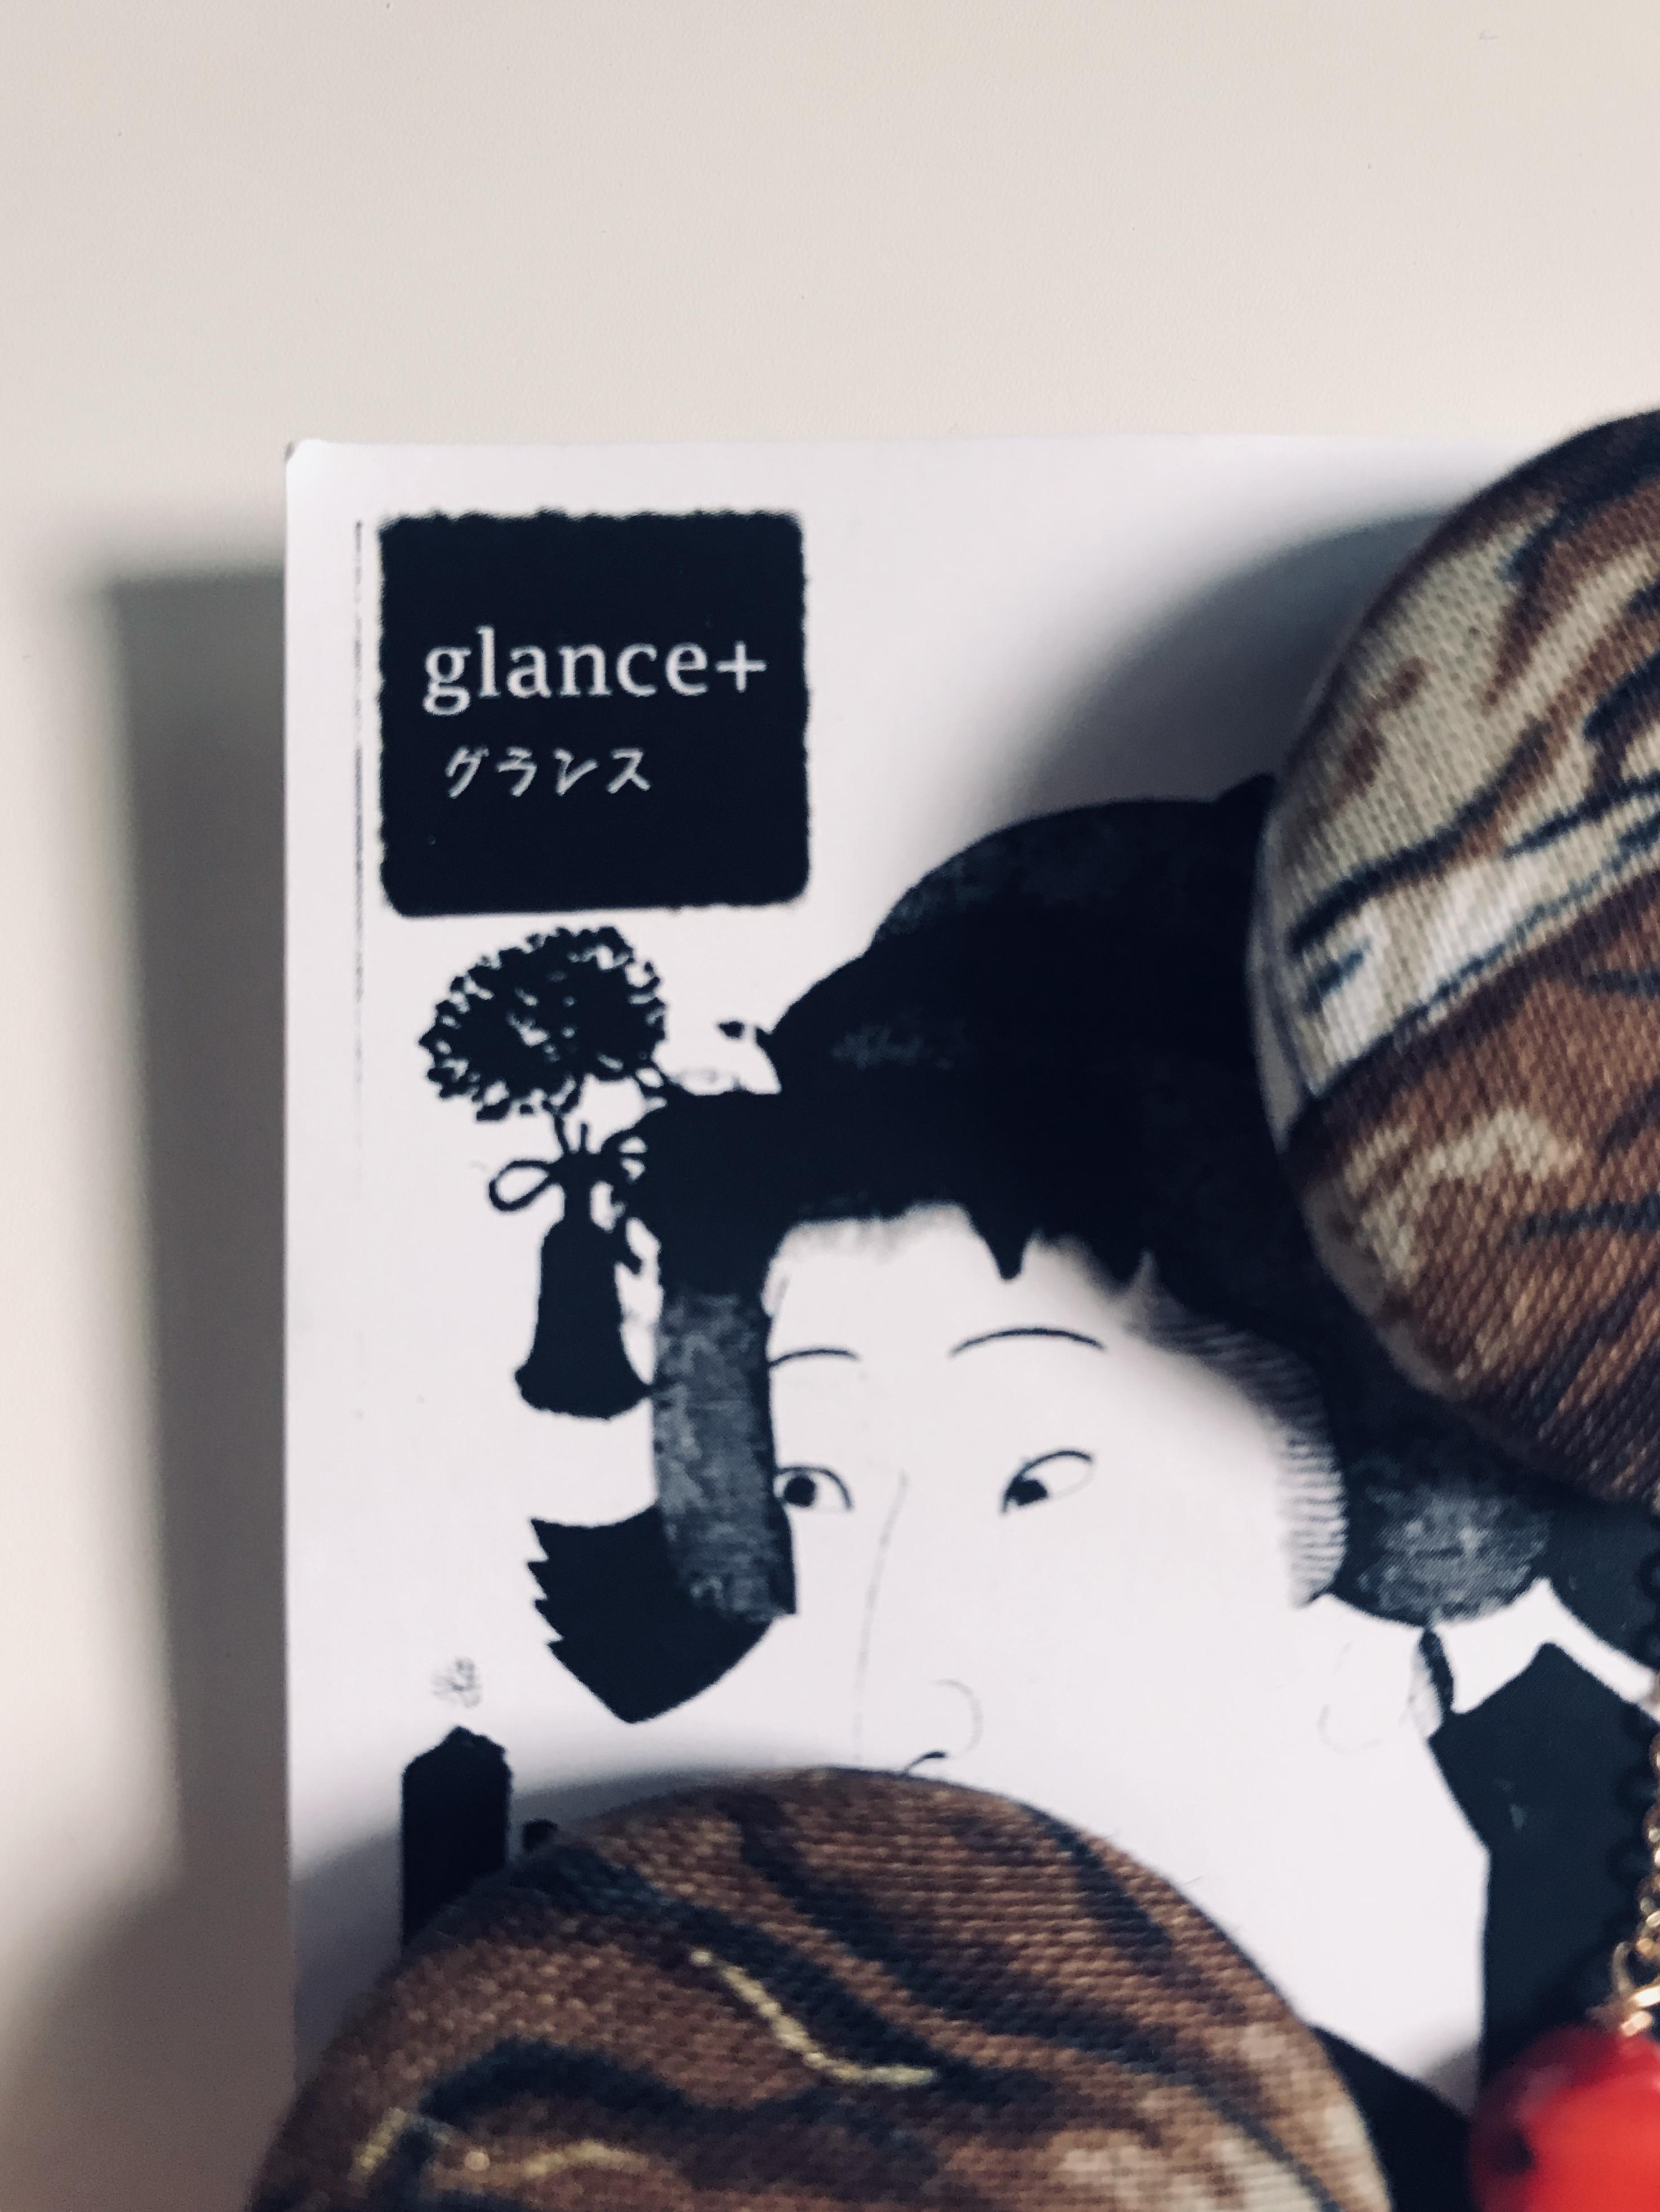 glance + 着物ピアス(ヴィンテージ羽織・虎柄−1)−13